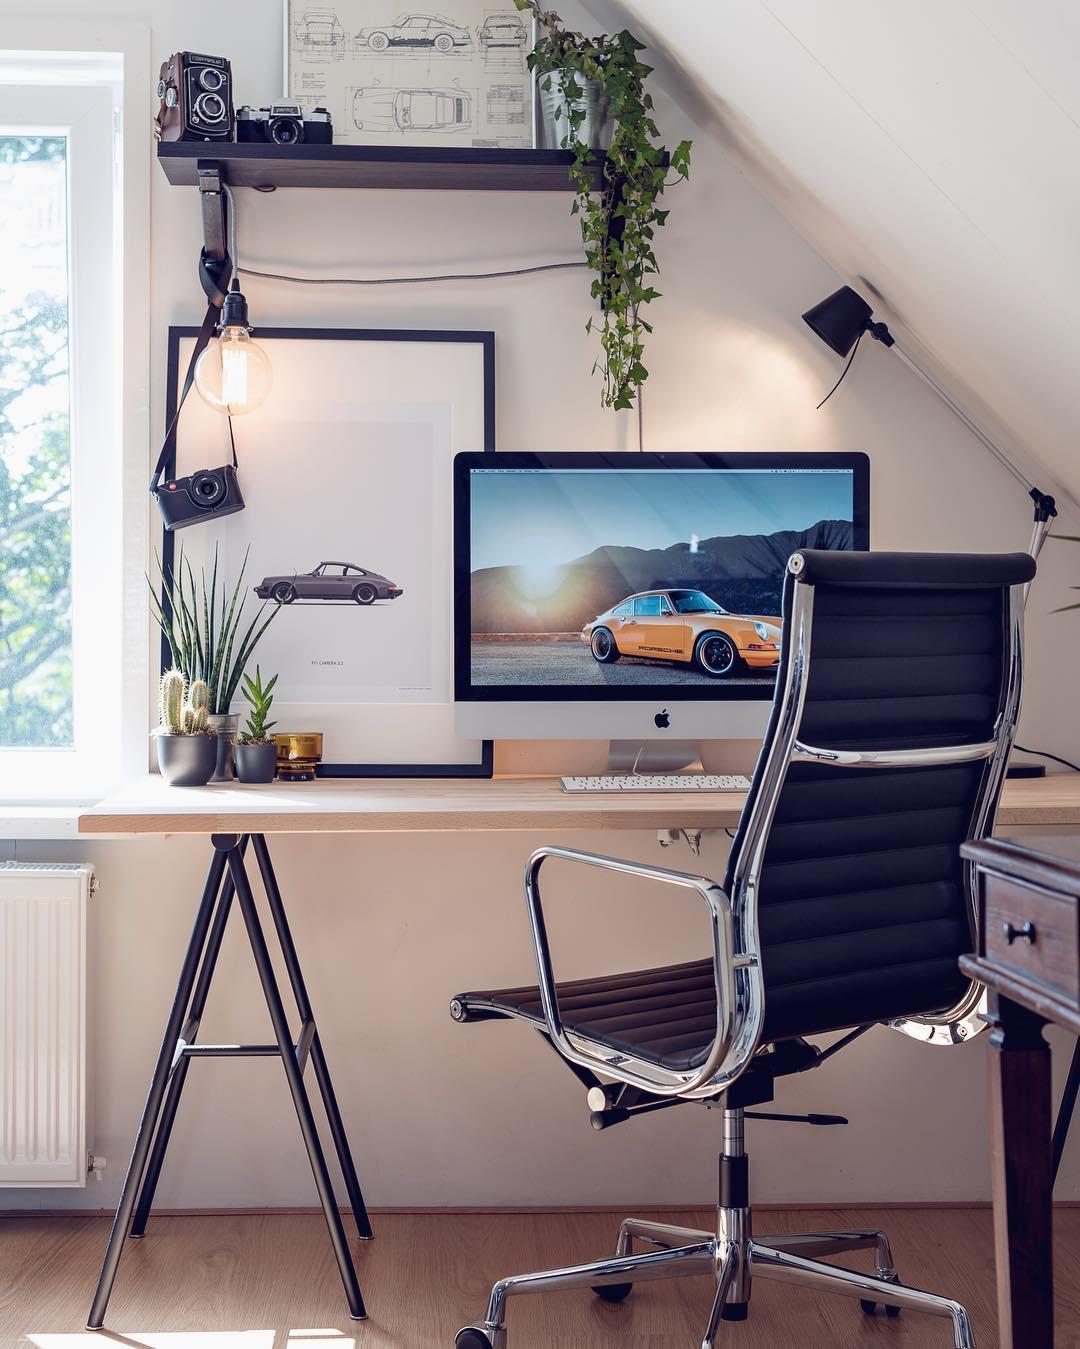 niels-onderwater-on-instagram-pretty-much-the-perfect-home-office-interiordesign-desksetup-scandicde-1468492472kg84n.jpg